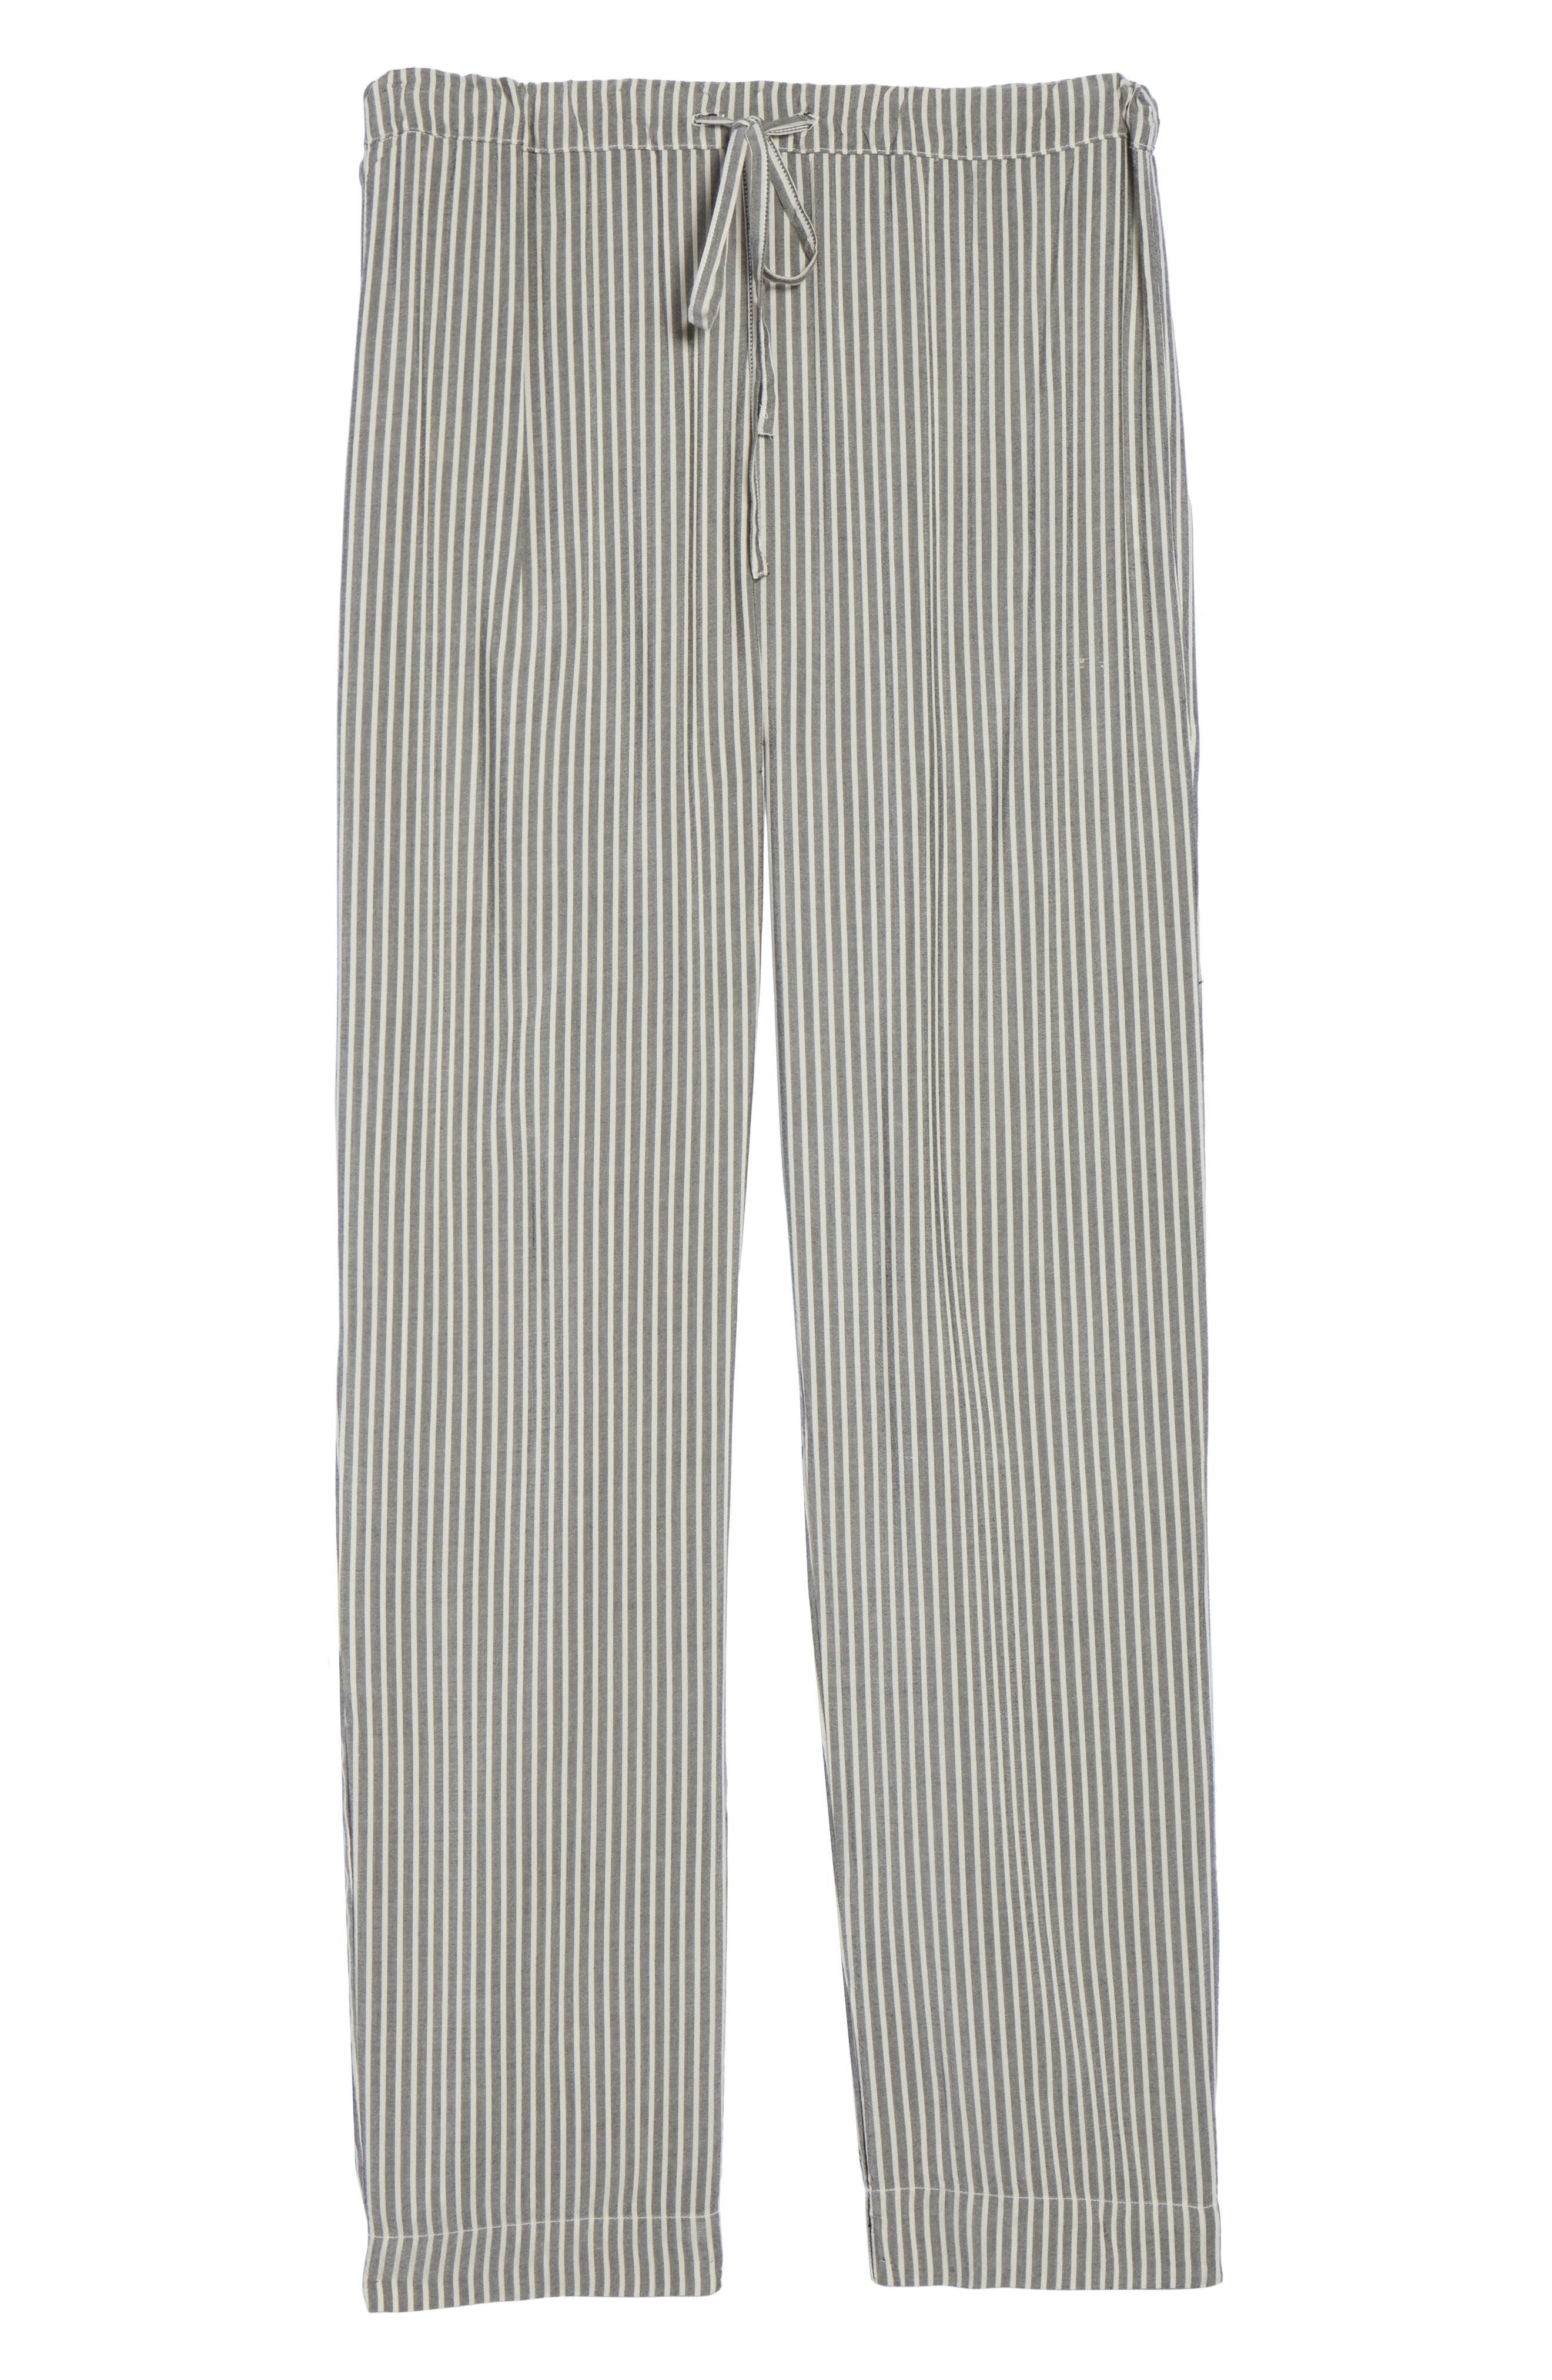 Stripe Pajama Pants,                             Alternate thumbnail 6, color,                             020